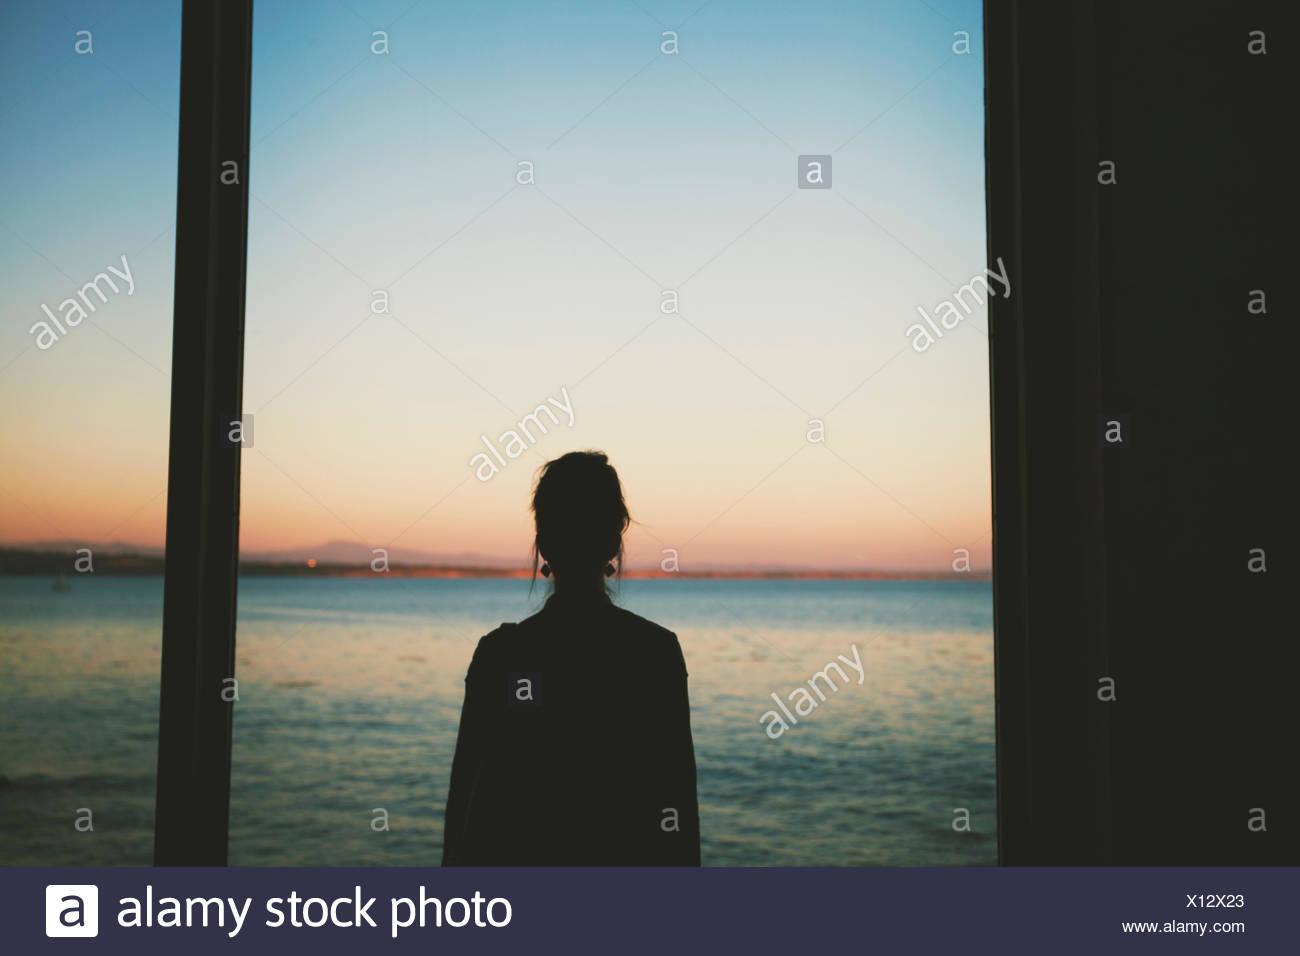 Woman looking at sea through window - Stock Image